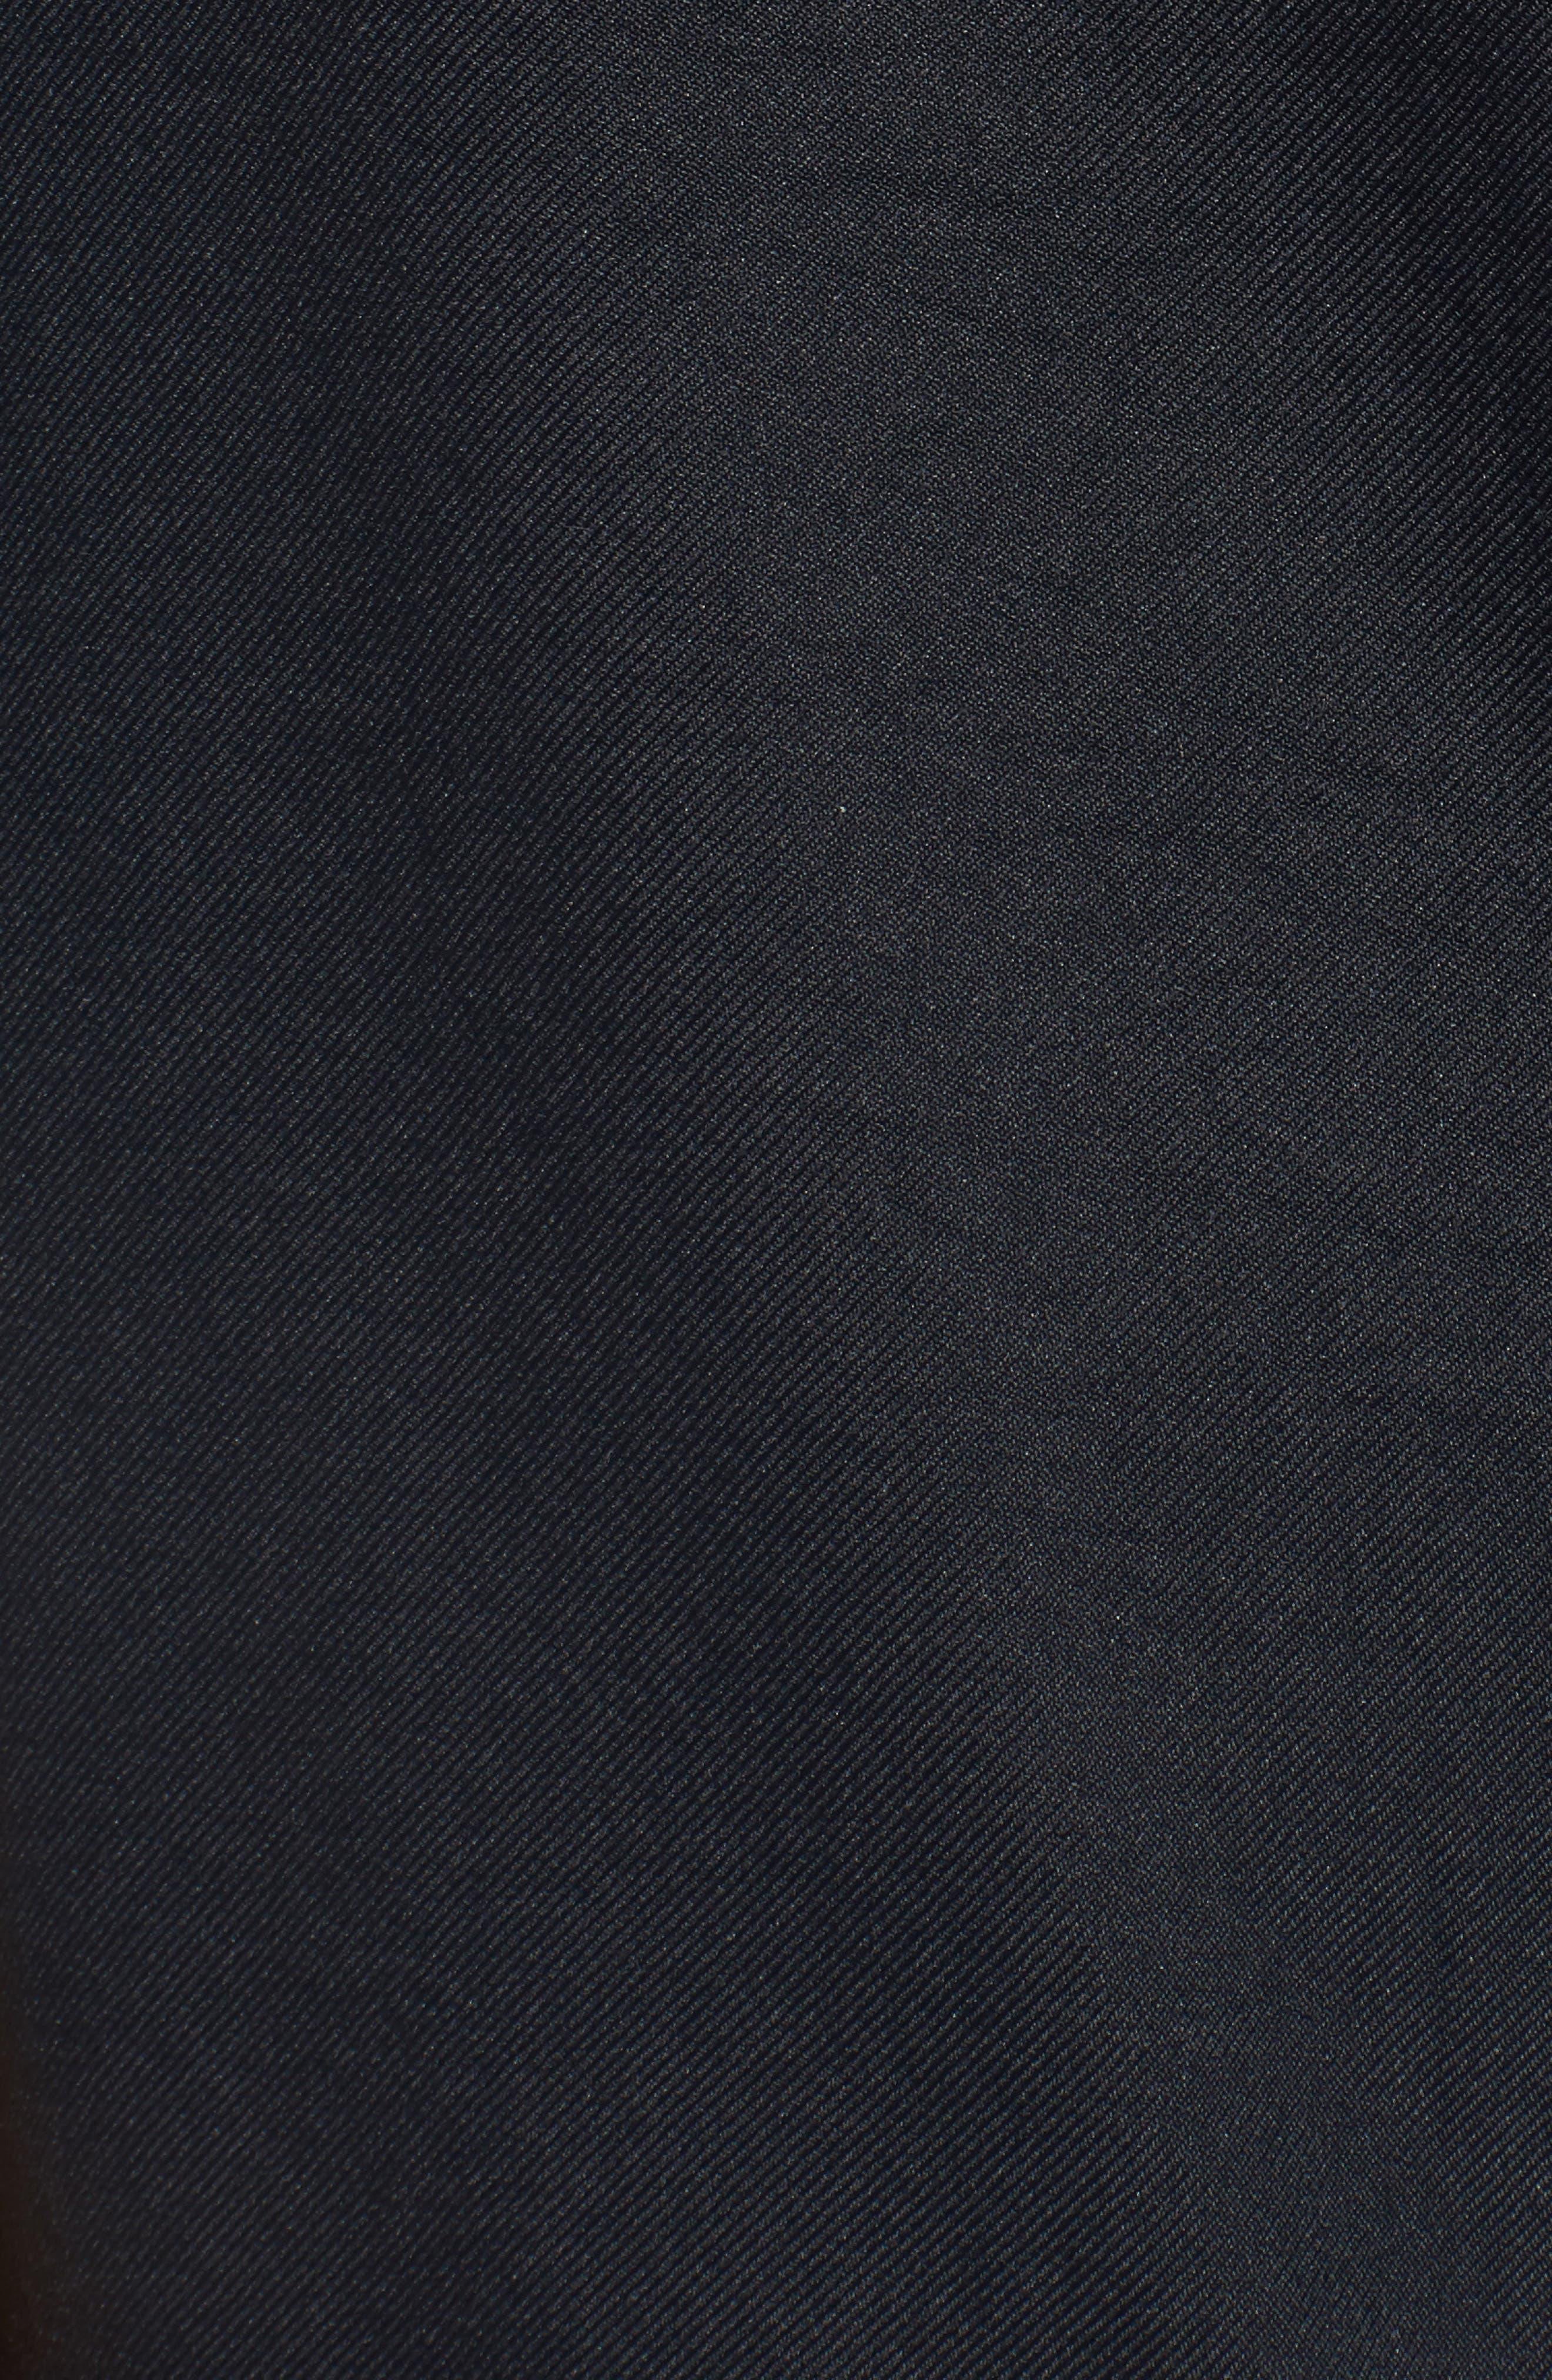 Zip Cocoon Dress,                             Alternate thumbnail 5, color,                             001